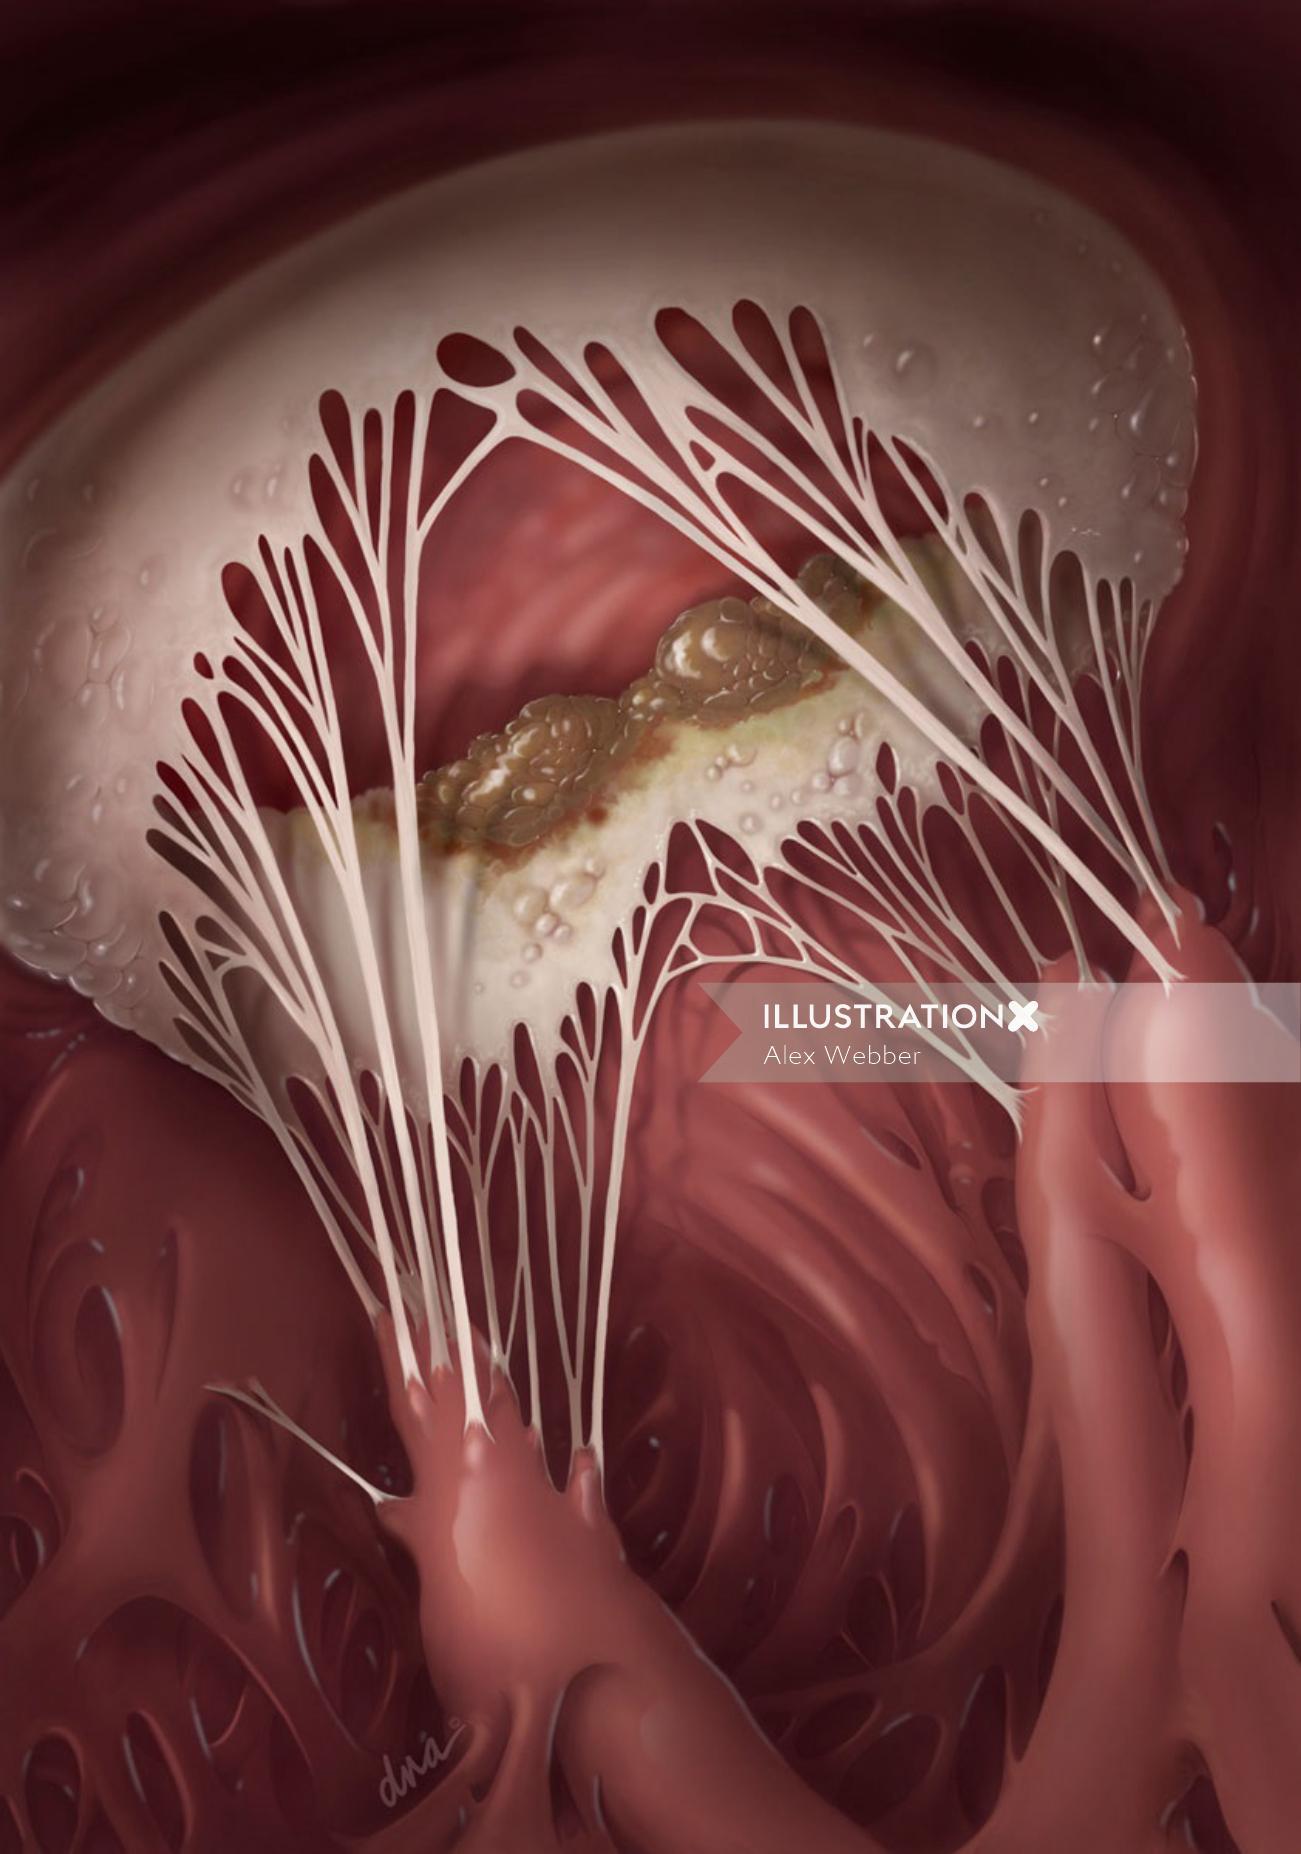 An illustration of Endocarditis